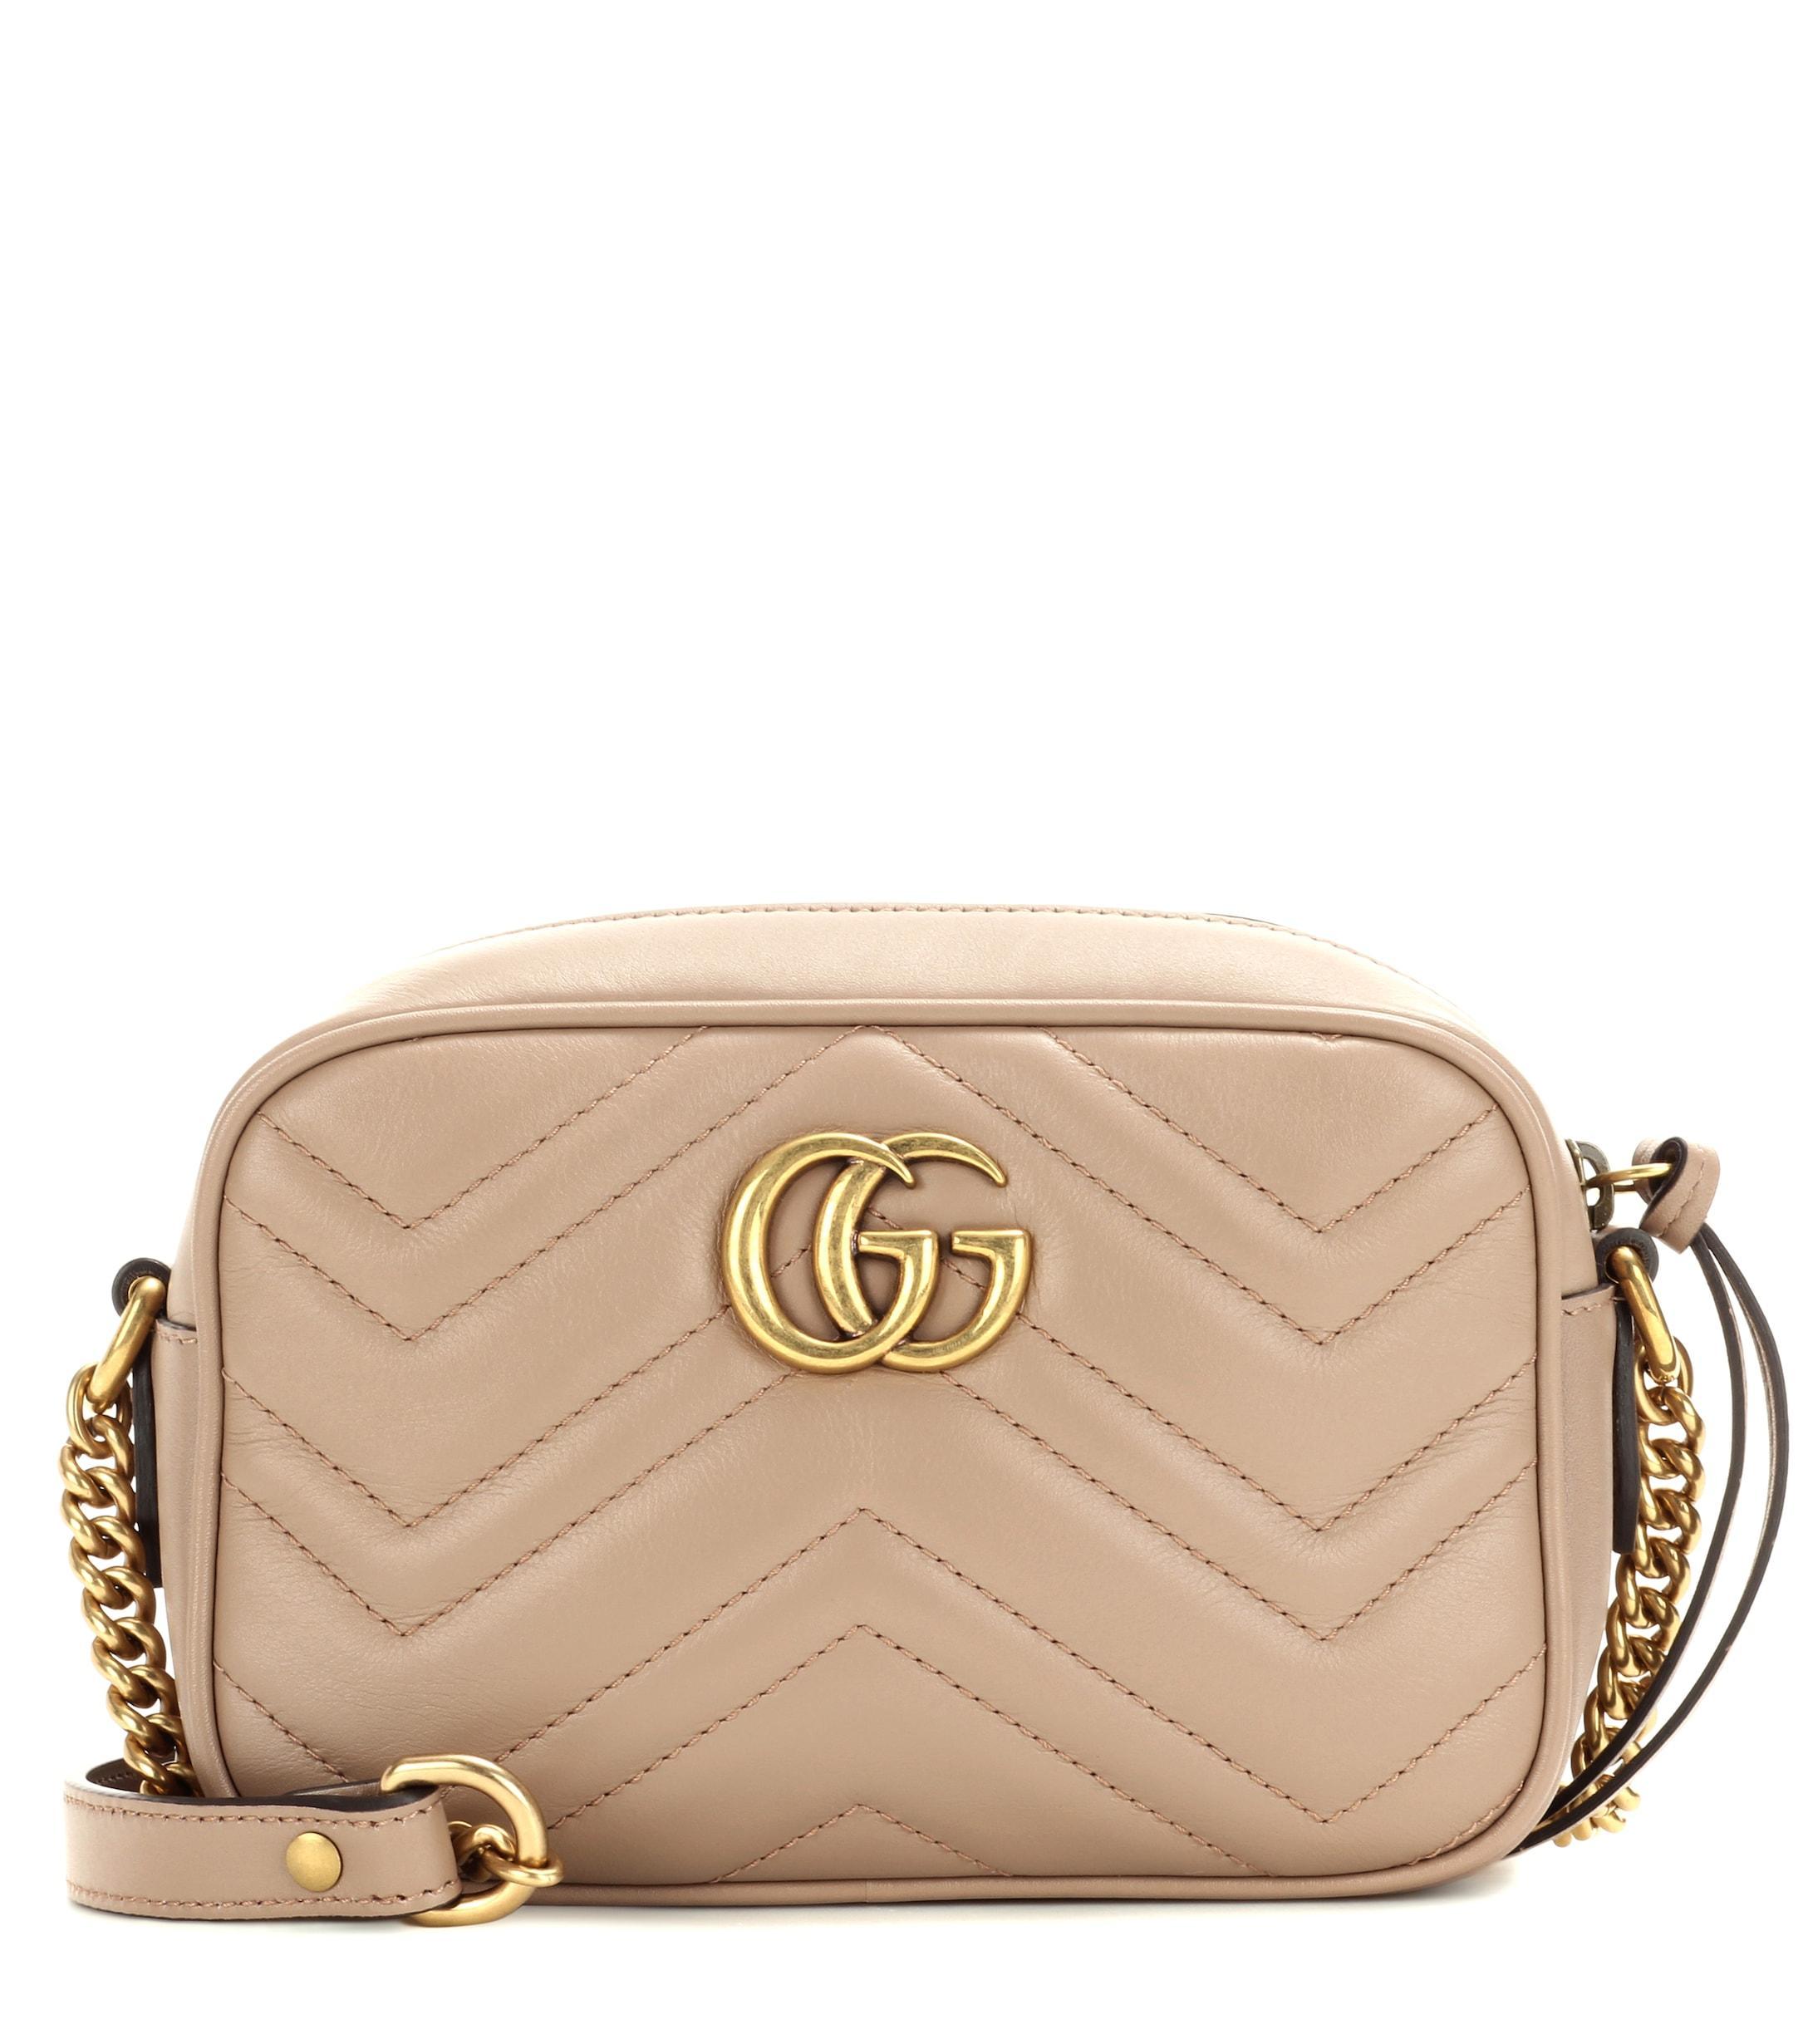 5a1358c3cc1 Gucci. Women s GG Marmont Mini Crossbody Bag